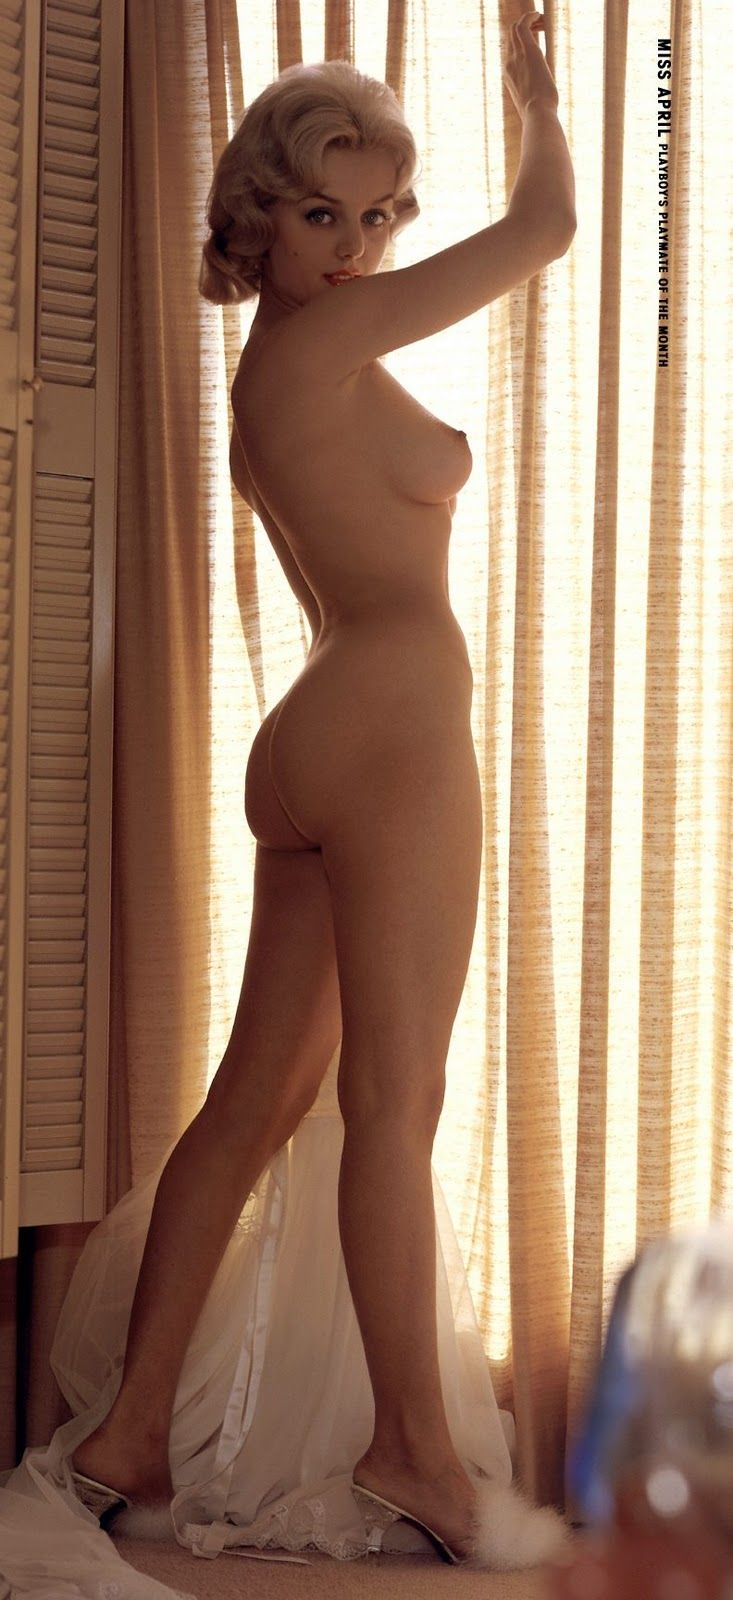 Stella Stevens Pussy Beautiful 760 best playboy playmates images on pinterest | playboy playmates